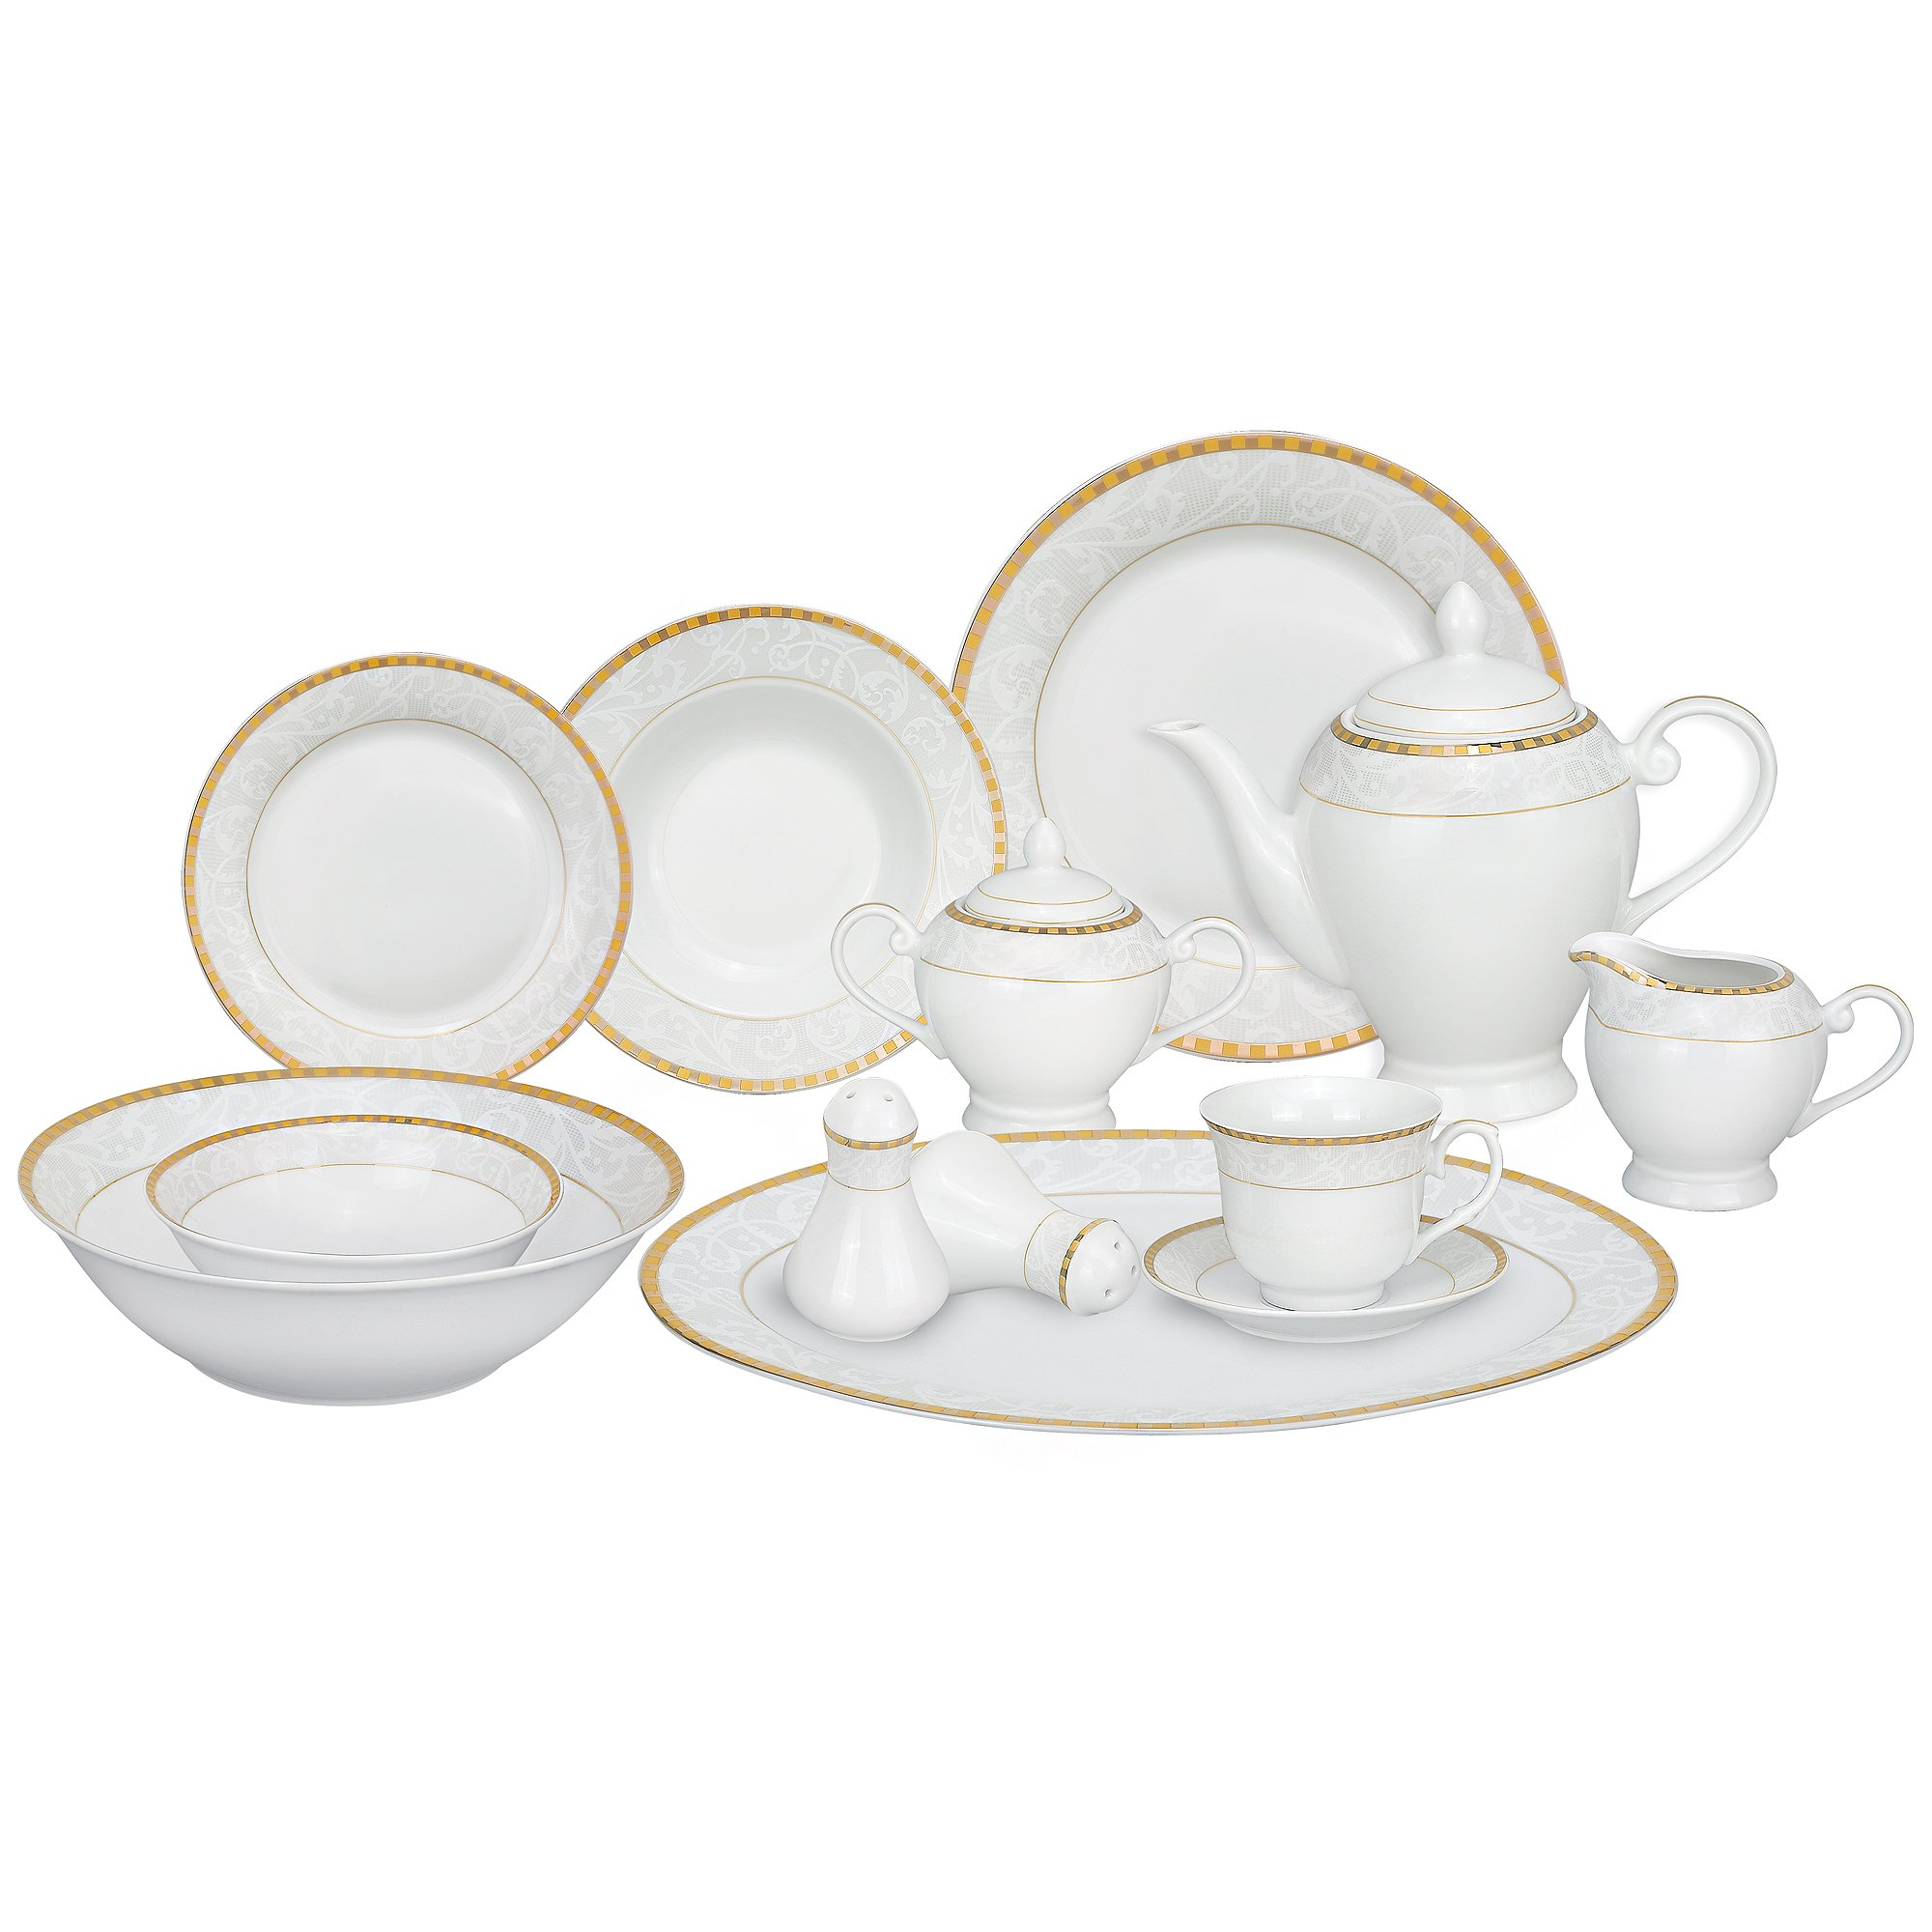 Lorren Home Trends 57-Piece Porcelain Dinnerware Set, Ricamo-GD, Service for 8